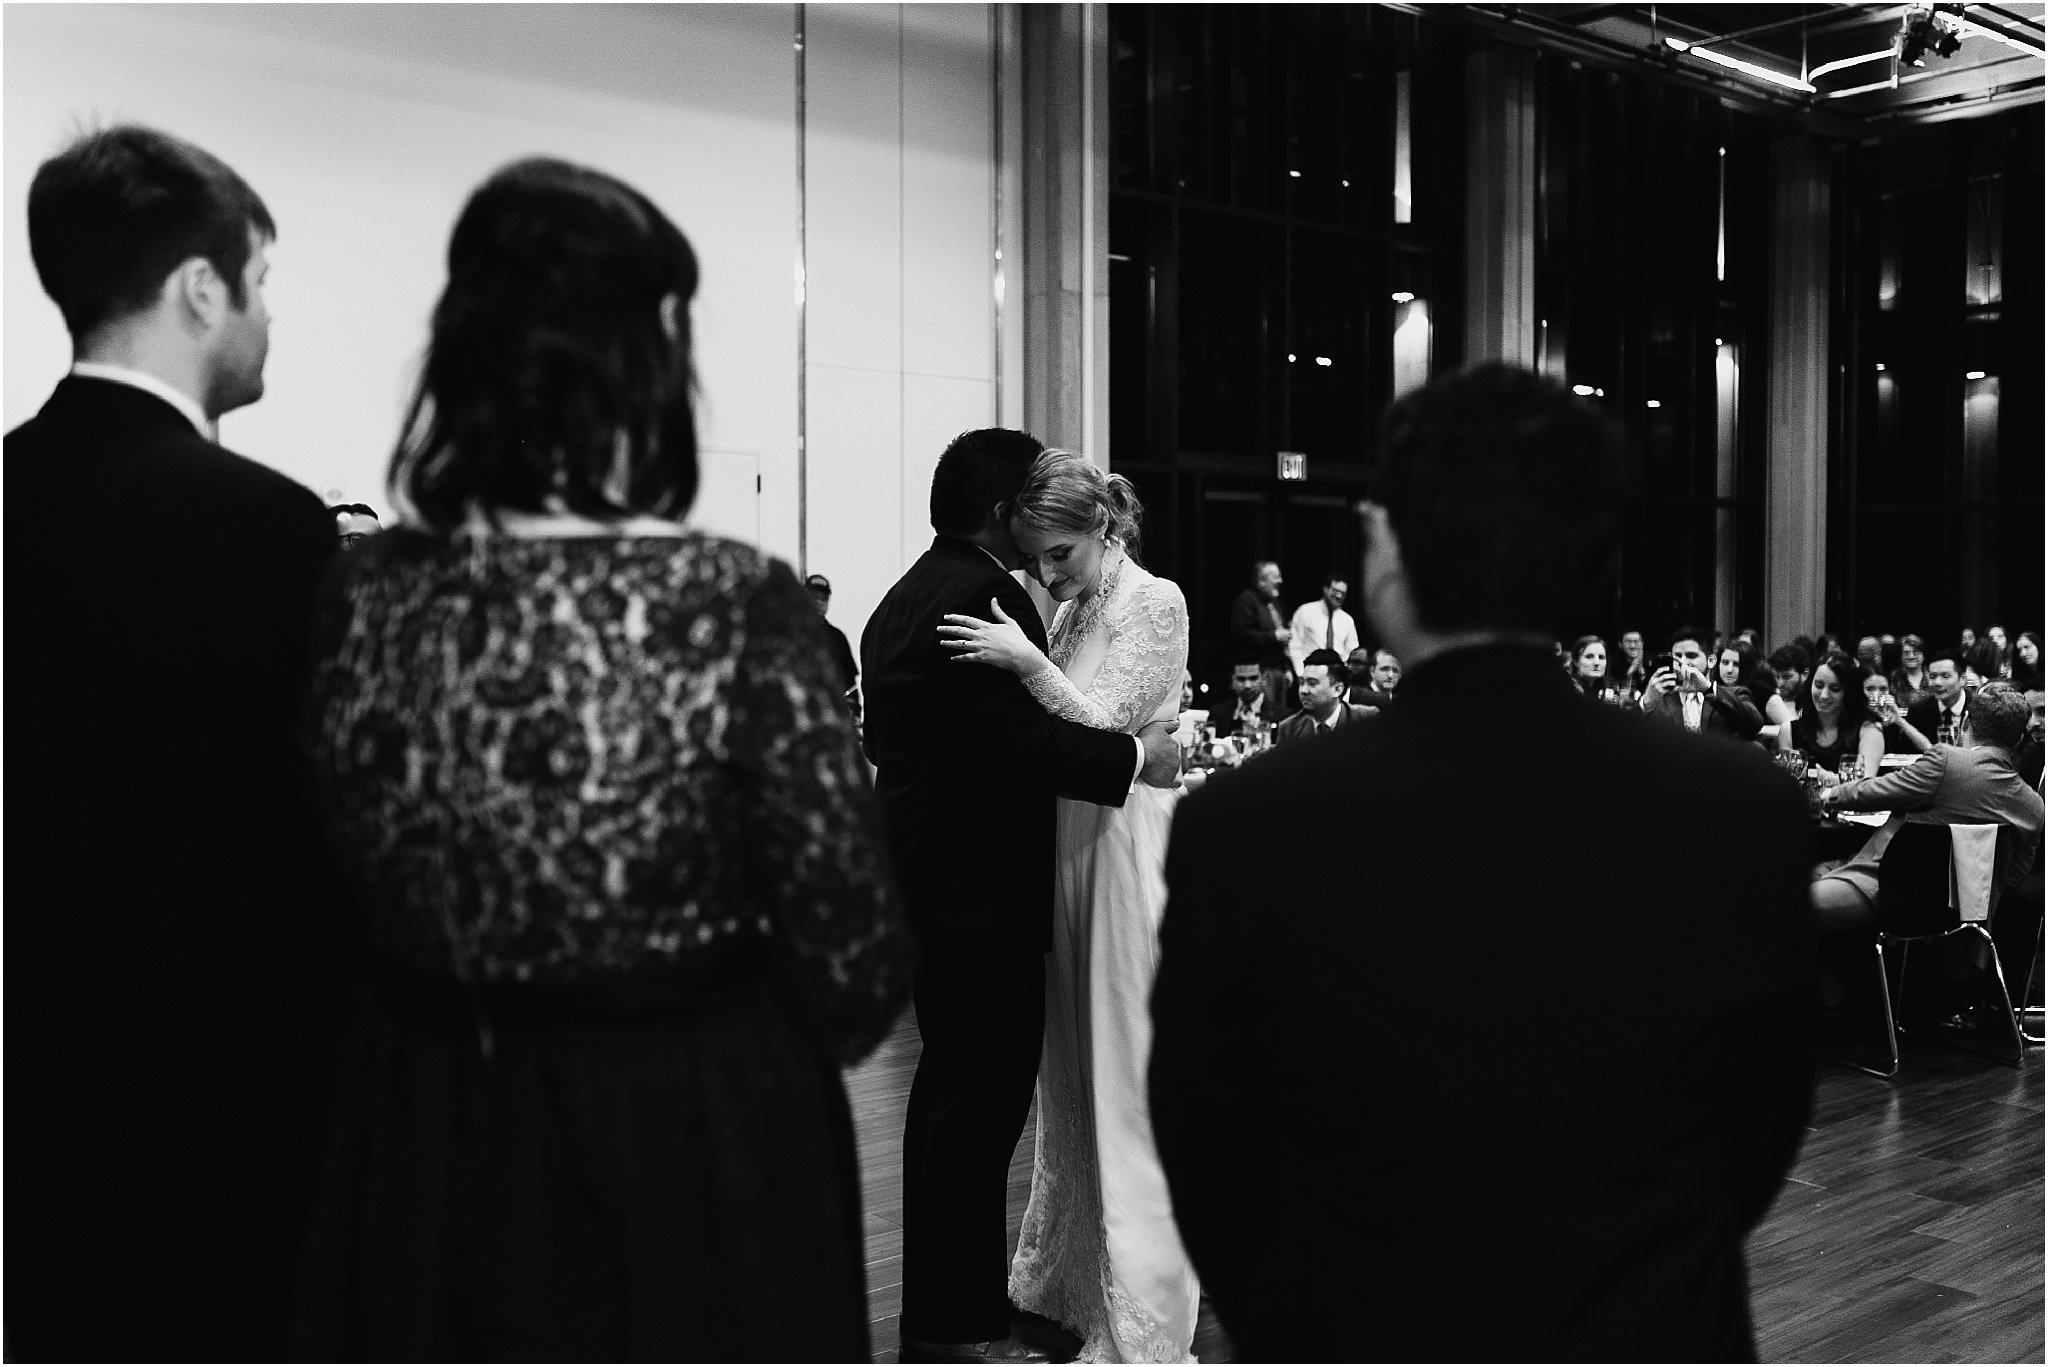 katy-robin-married-in-mukilteo-wedding37.jpg